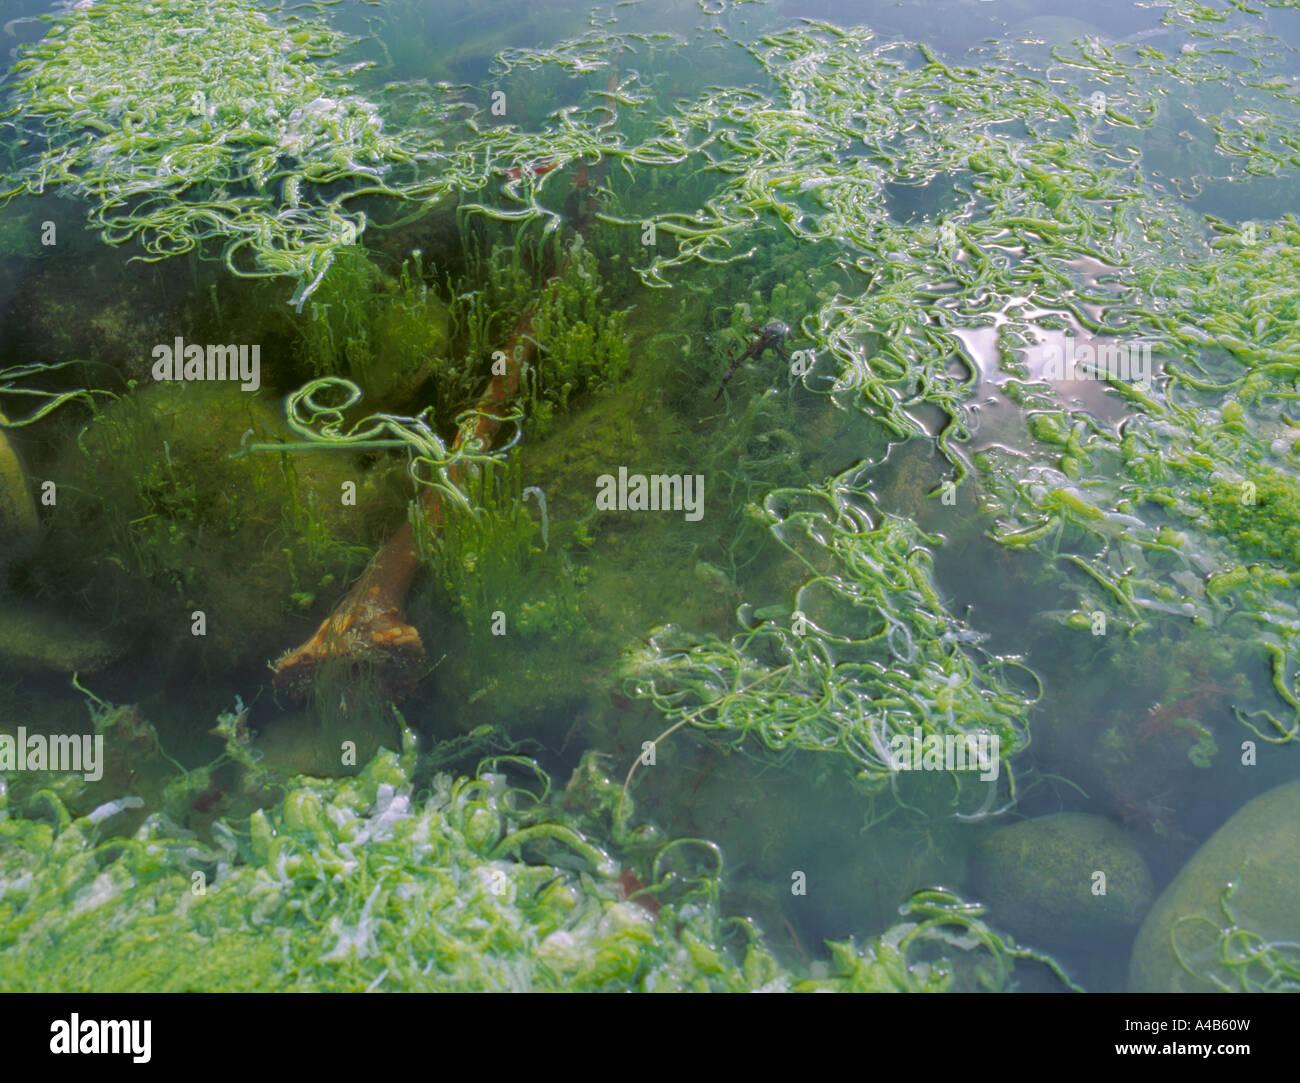 Seaweed, Gut Weed (Enteromorpha intestinalis), in a rockpool; Barra, Outer Hebrides, Scotland, UK. - Stock Image